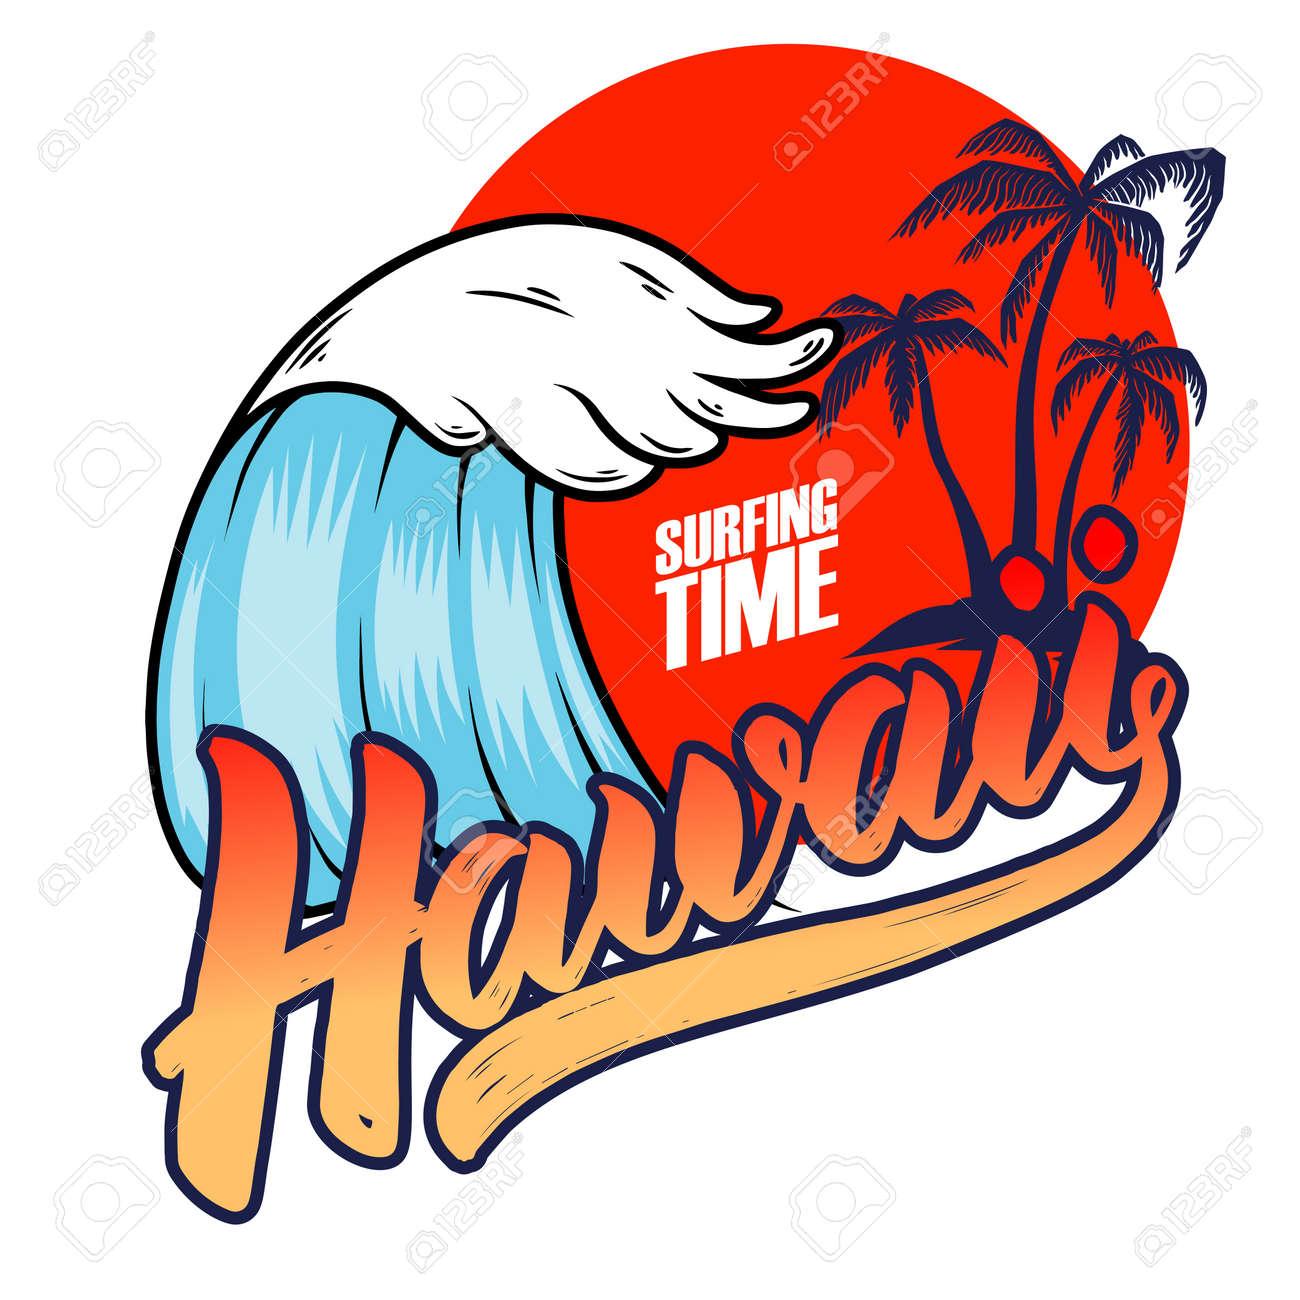 Hawaii. Emblem template with sea waves and palms. Design element for poster, card, banner, sign, emblem. Vector illustration - 170096243